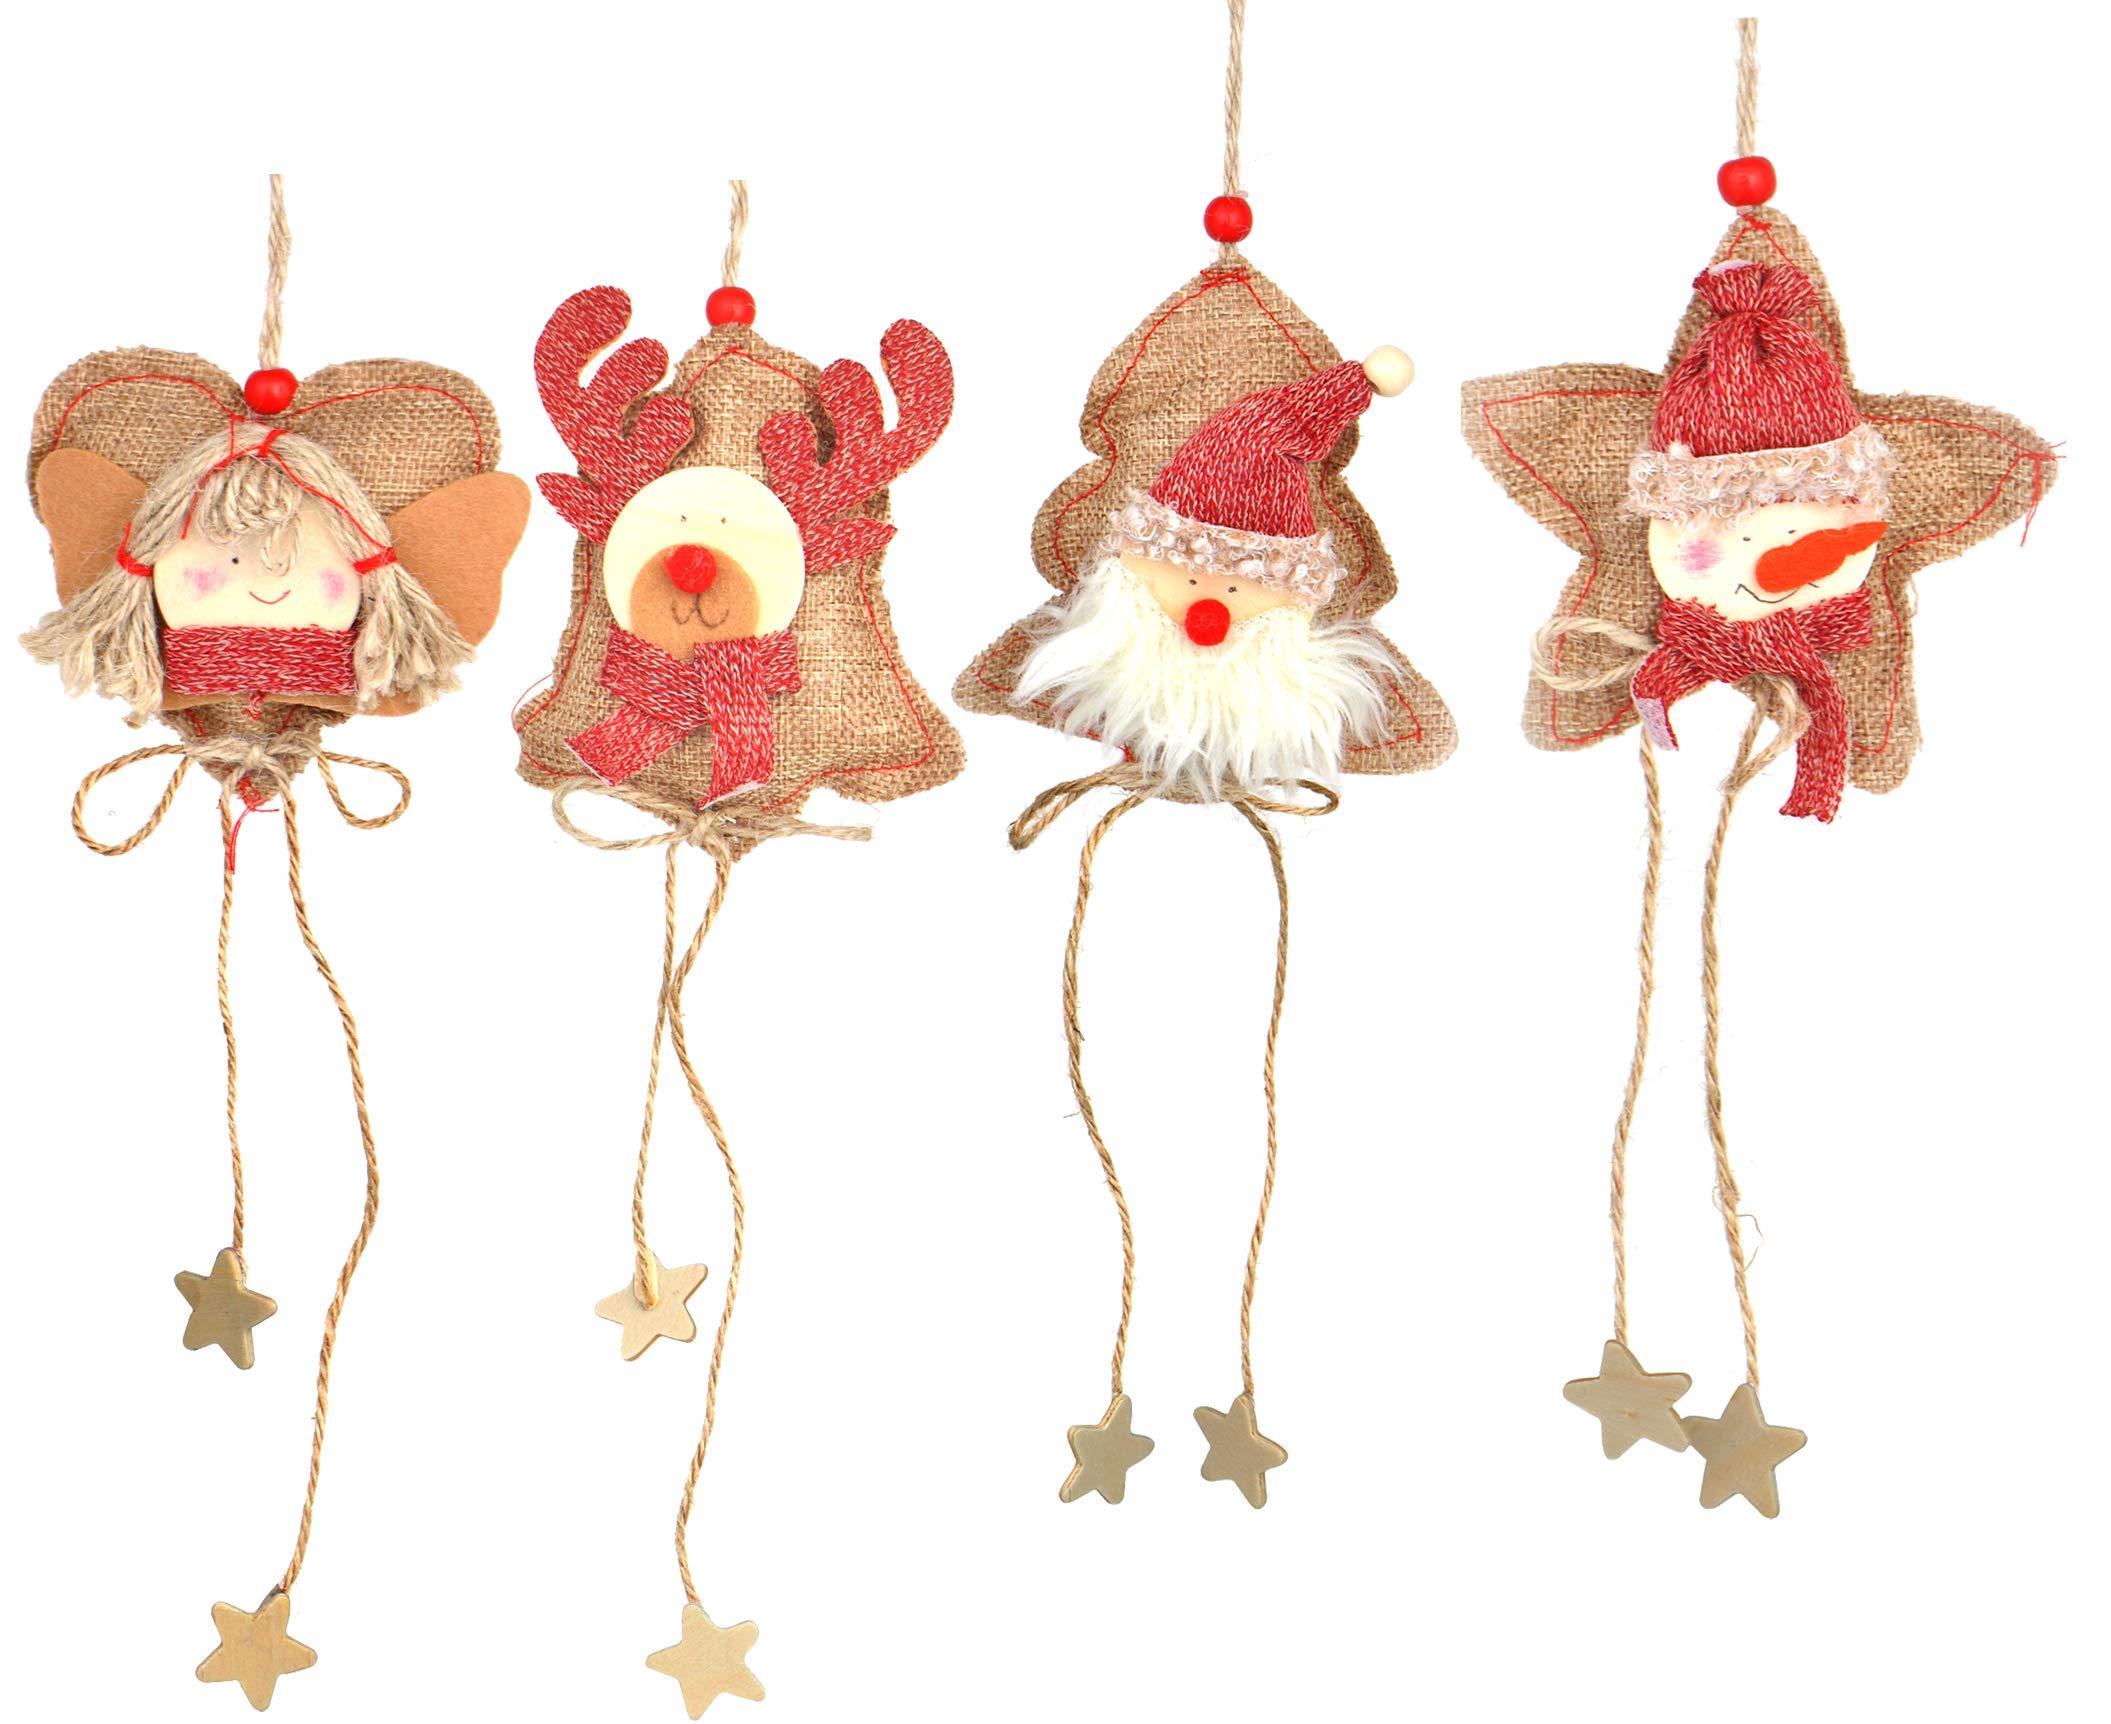 ZAloha Heart Star Ornaments Party Decorations 8pcs Rustic Burlap Moose/Snowman/Santa Claus/Bell